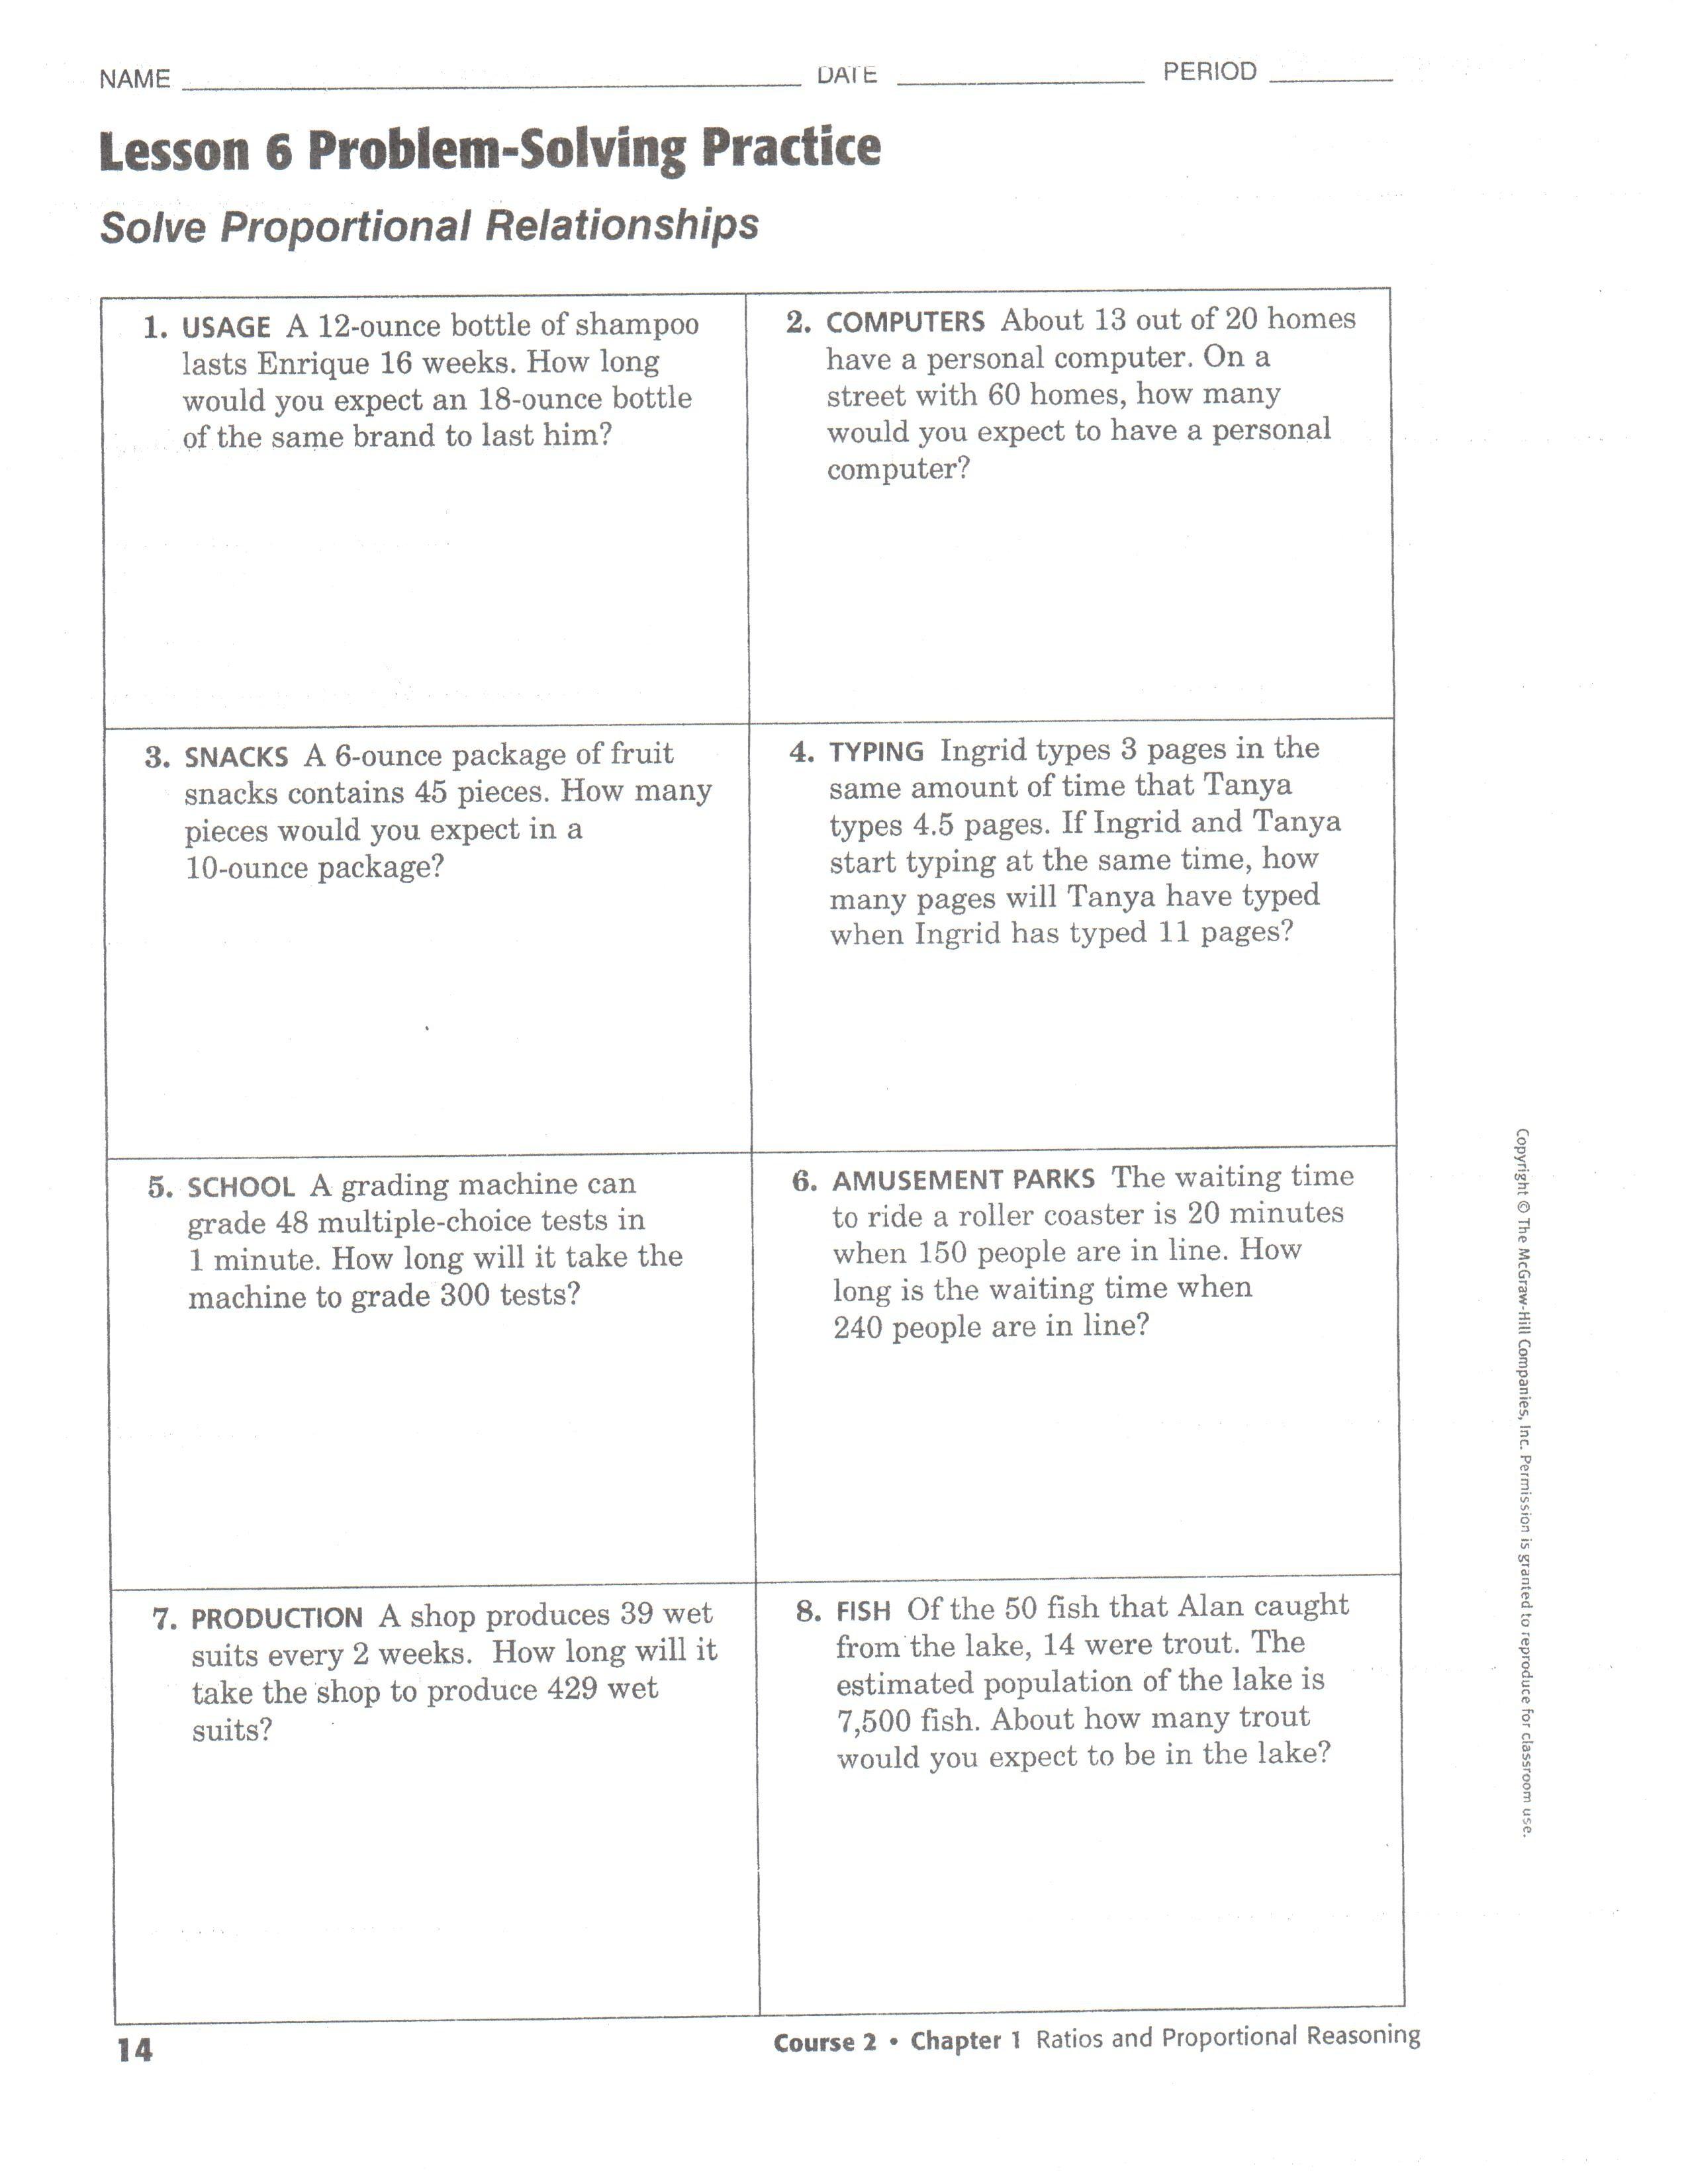 worksheet Proportional Reasoning Worksheets millikan middle school affiliated charter performing arts magnet ch1 l6 problem solving practice jpeg worksheet